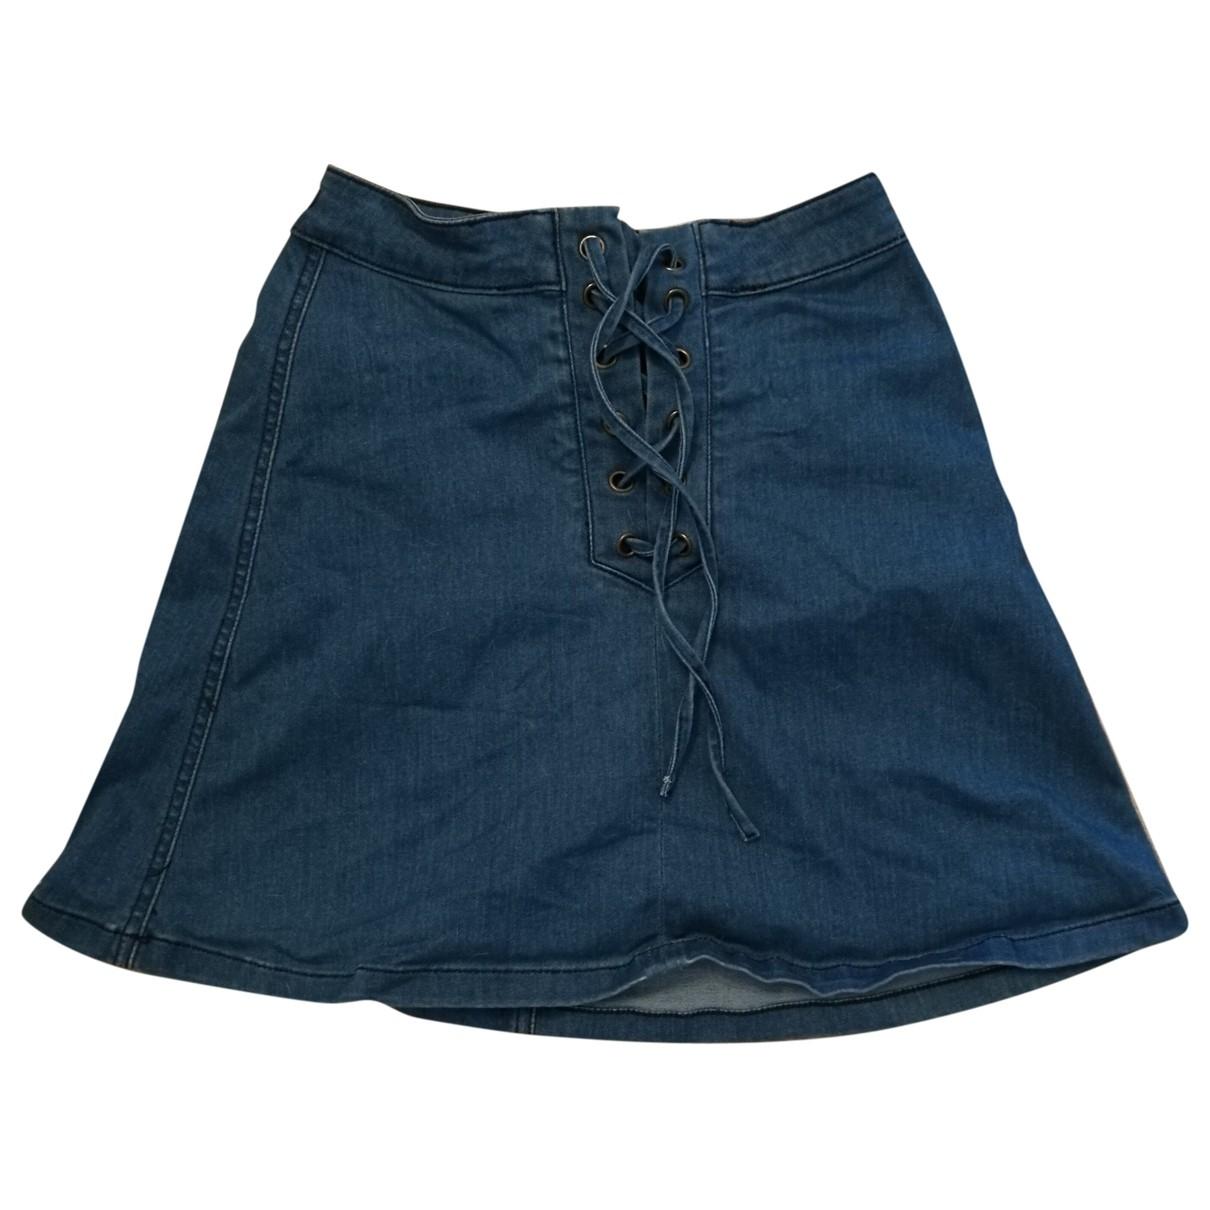 Guess \N Blue Denim - Jeans skirt for Women XS International